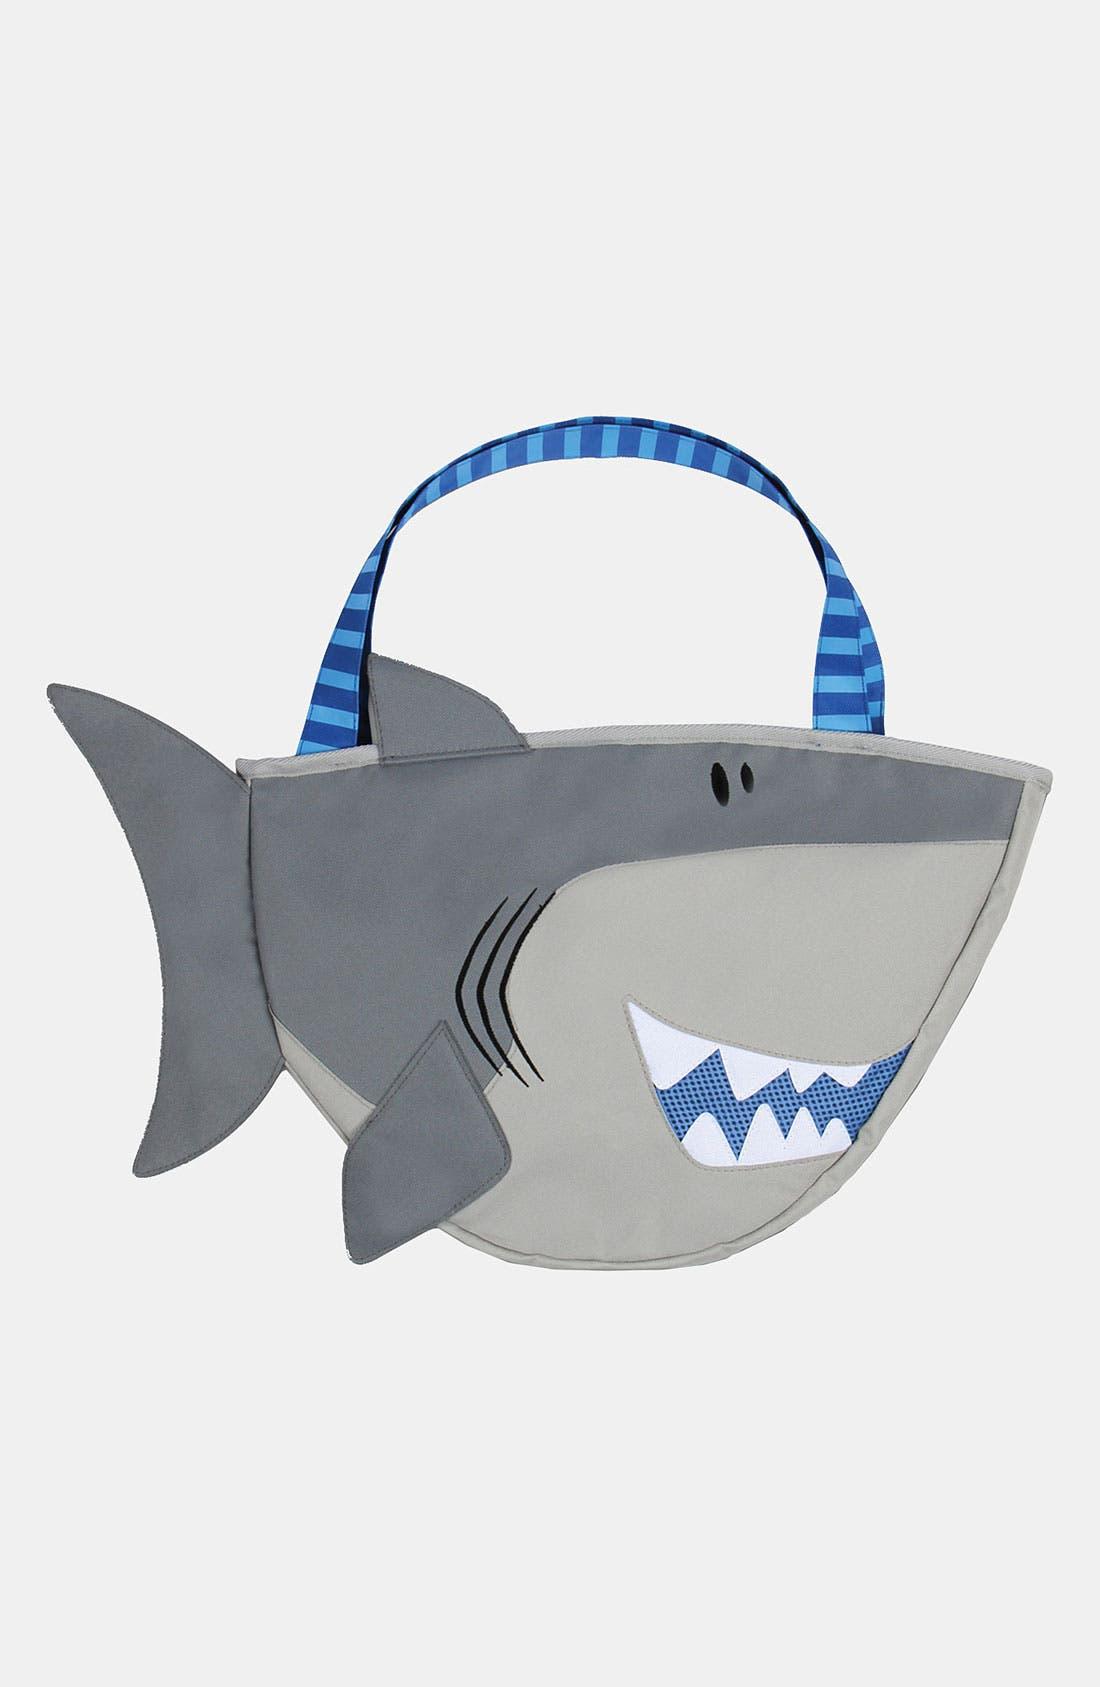 Alternate Image 1 Selected - Stephen Joseph 'Shark' Beach Tote & Toys